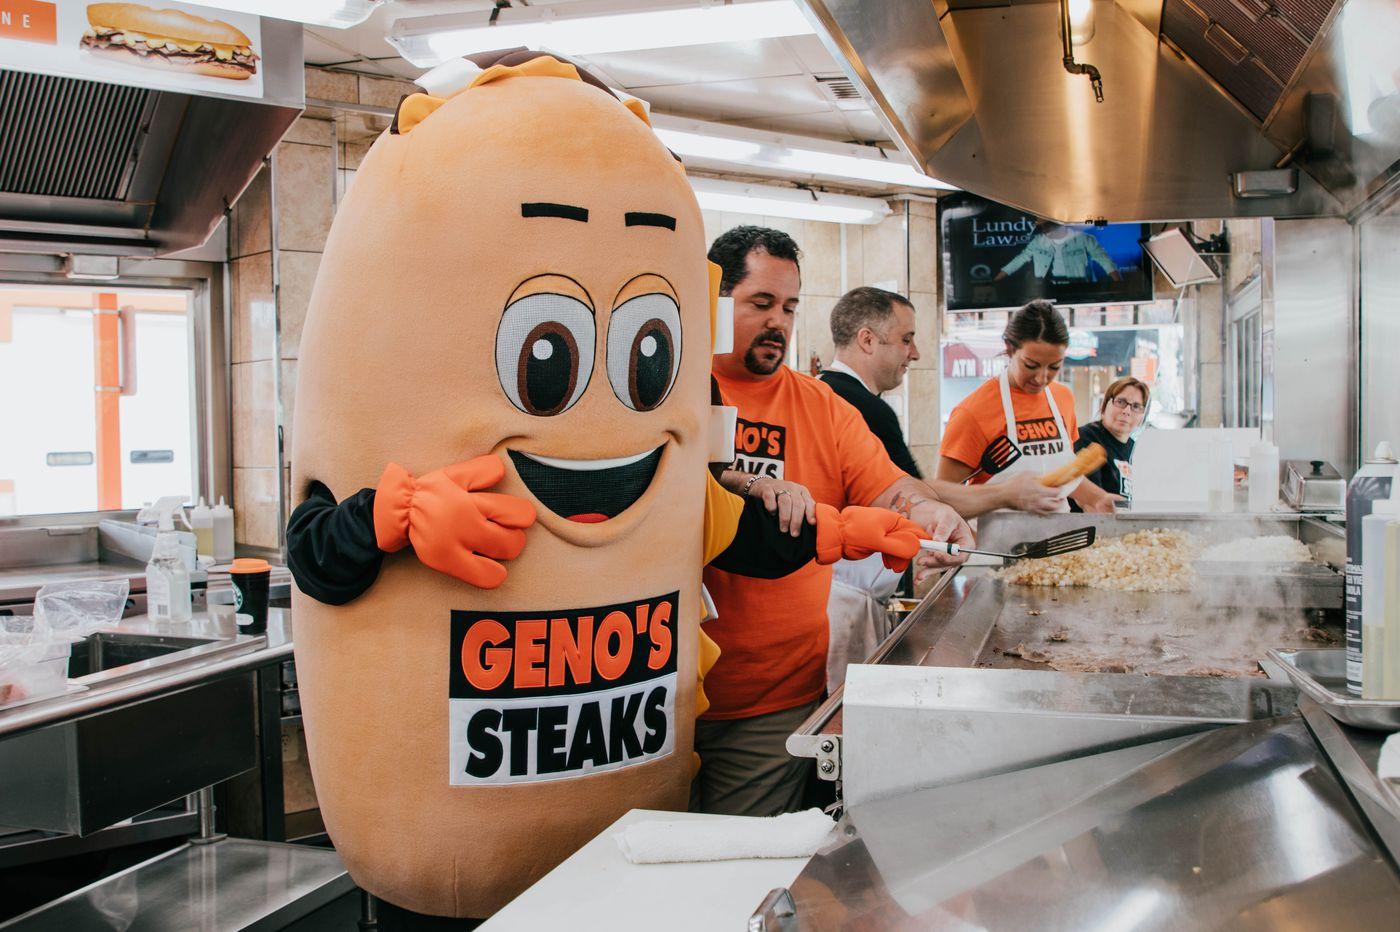 Geno's debuts new cheesesteak mascot 'Whizzy'